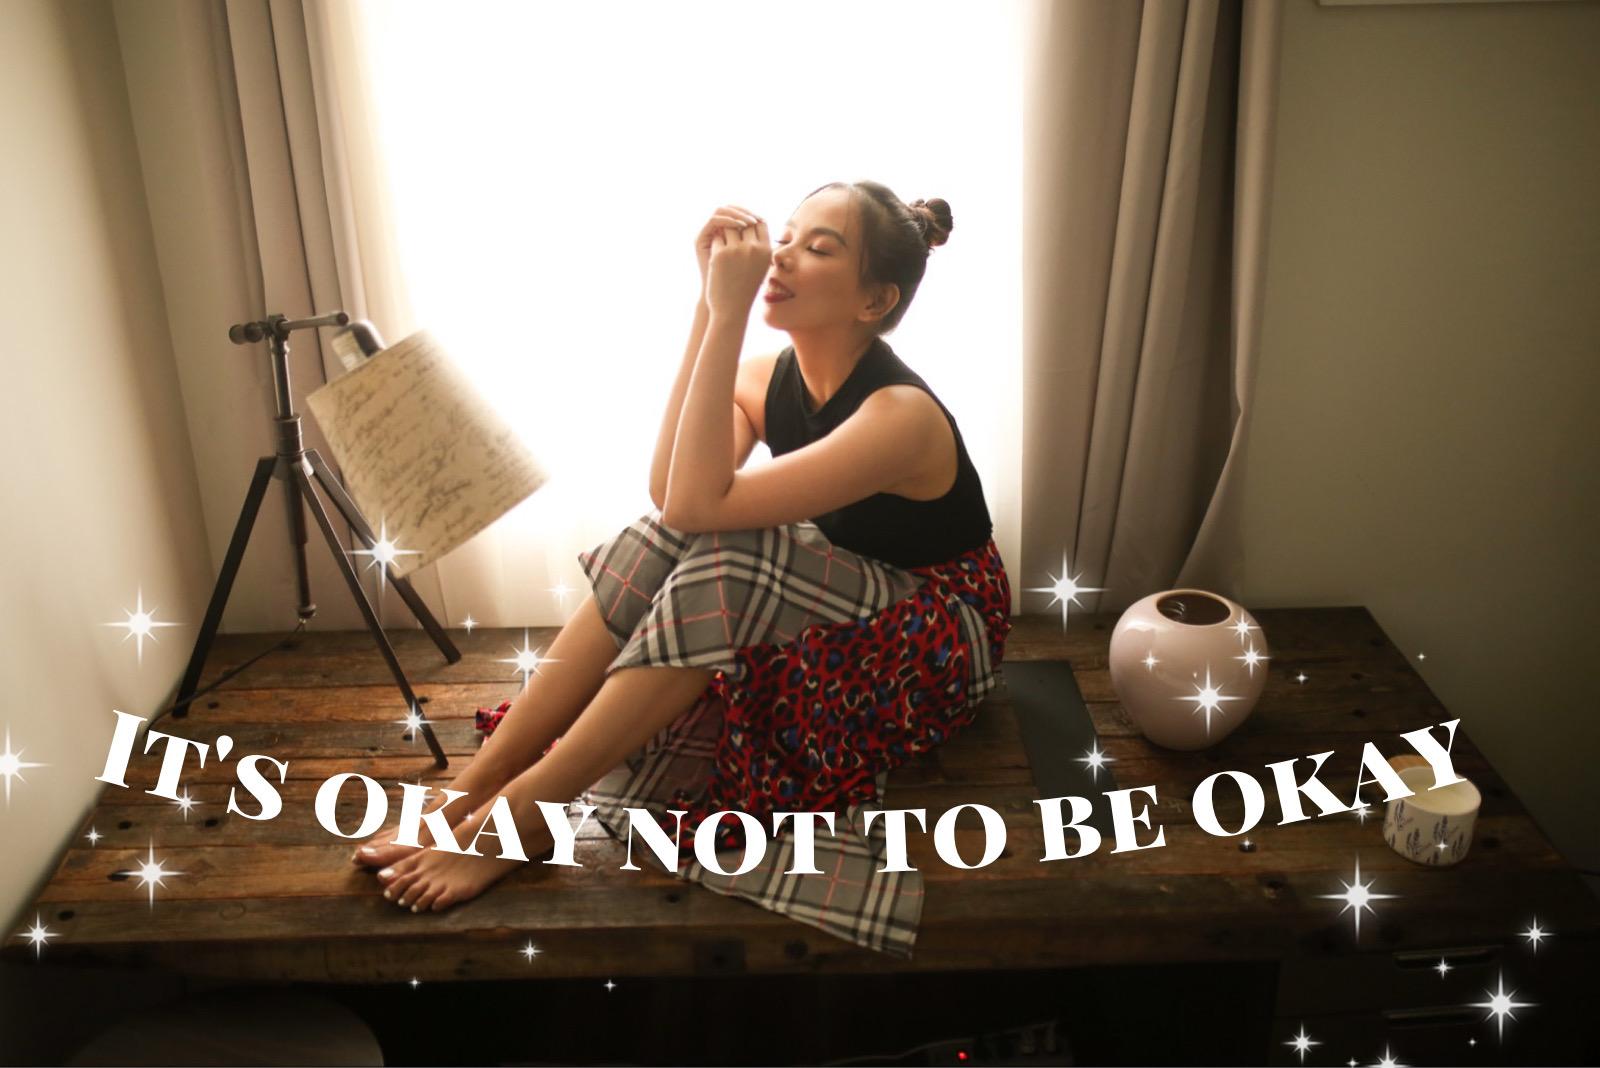 Mental Health Talks: I Tried Seeking Help and Here's How It Went